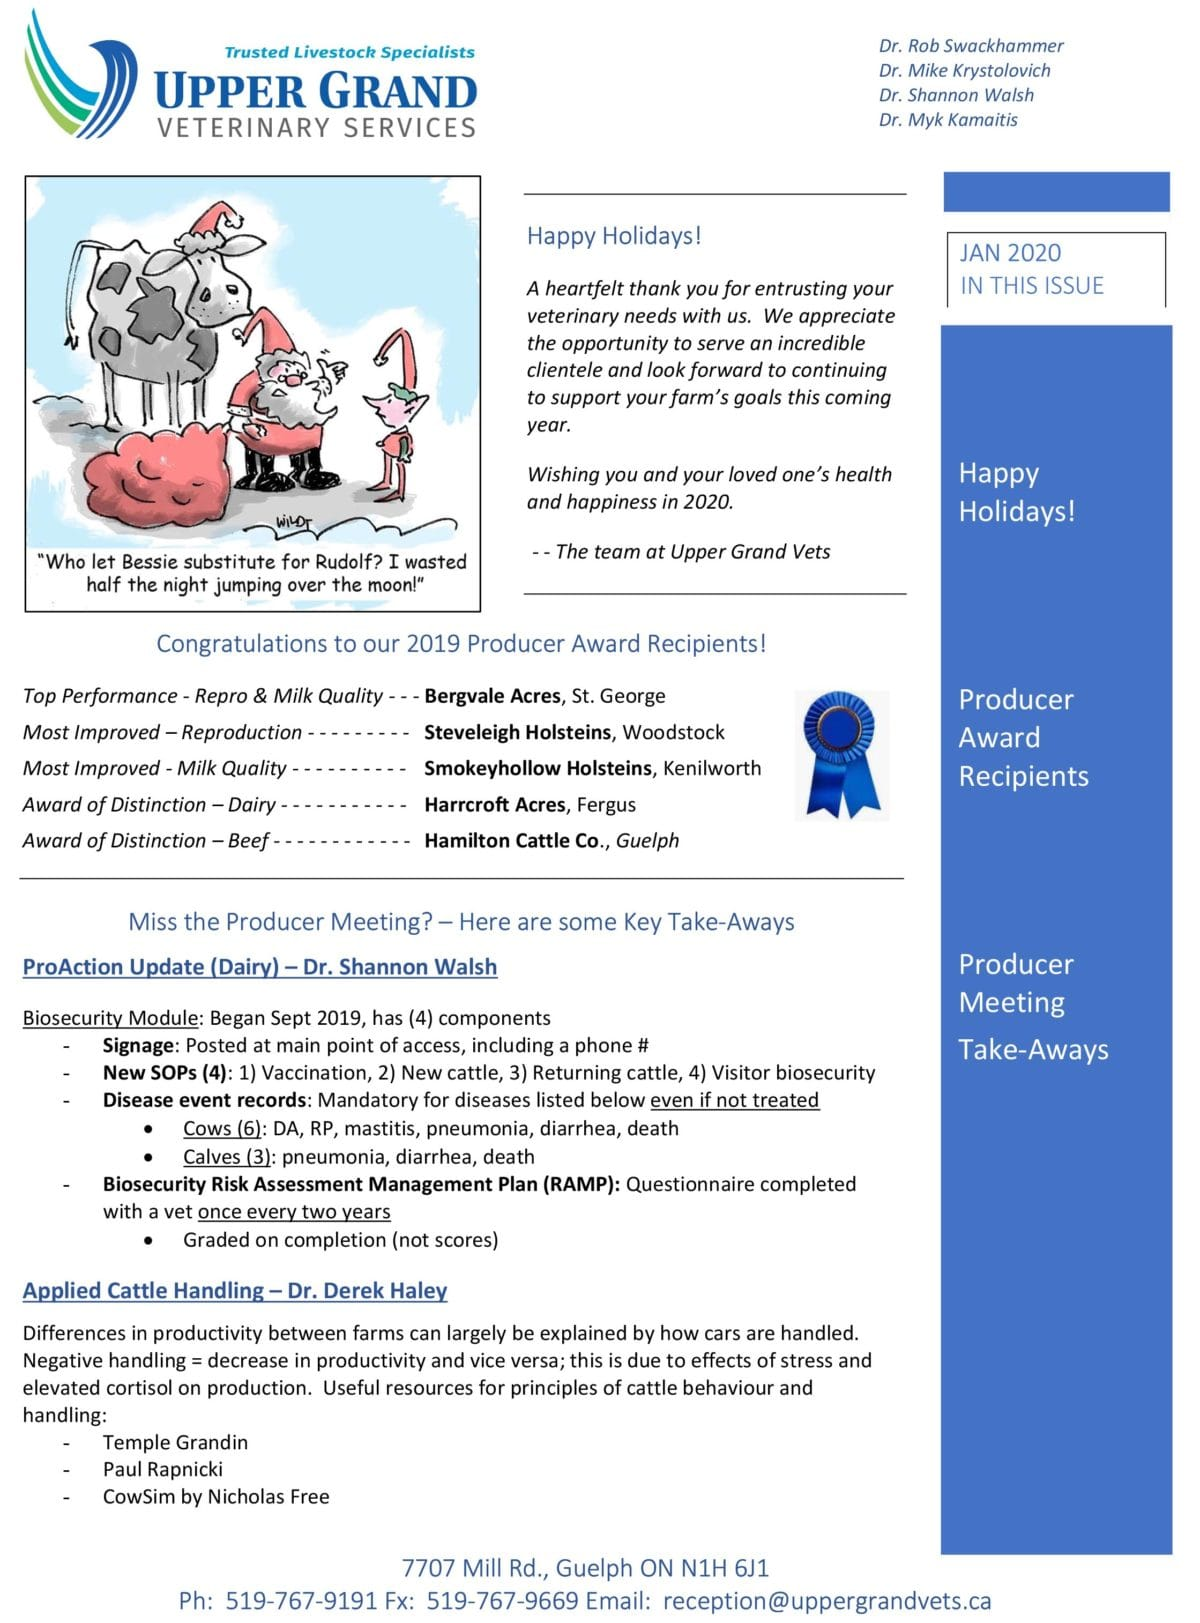 UGVS-Newsletter_Jan-2020-1-copy-1200x1623.jpg